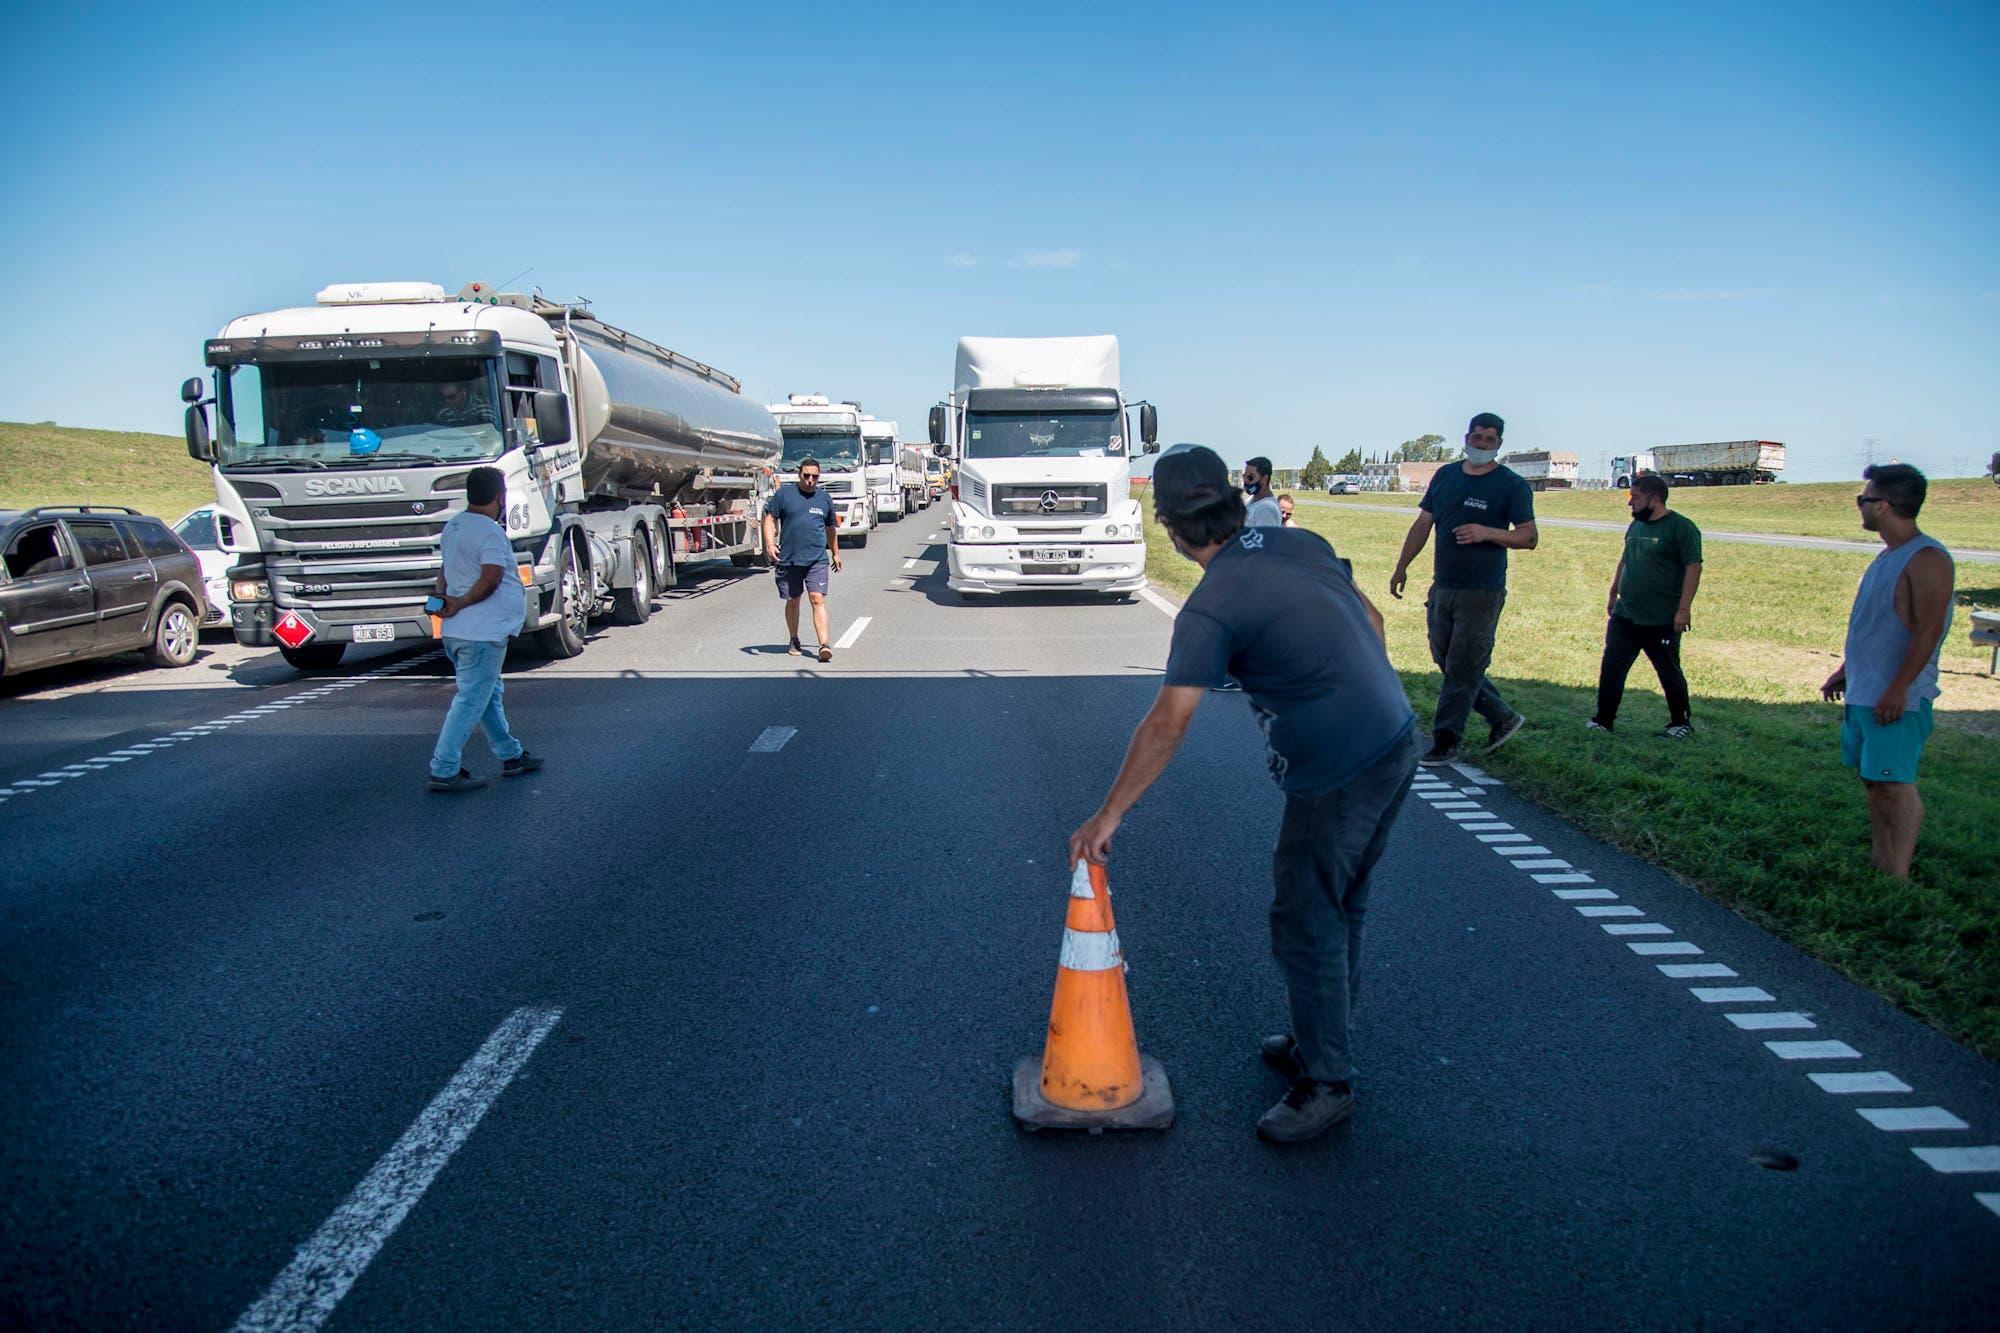 Paro del transporte: Santa Fe liberó rutas, pero la protesta continúa